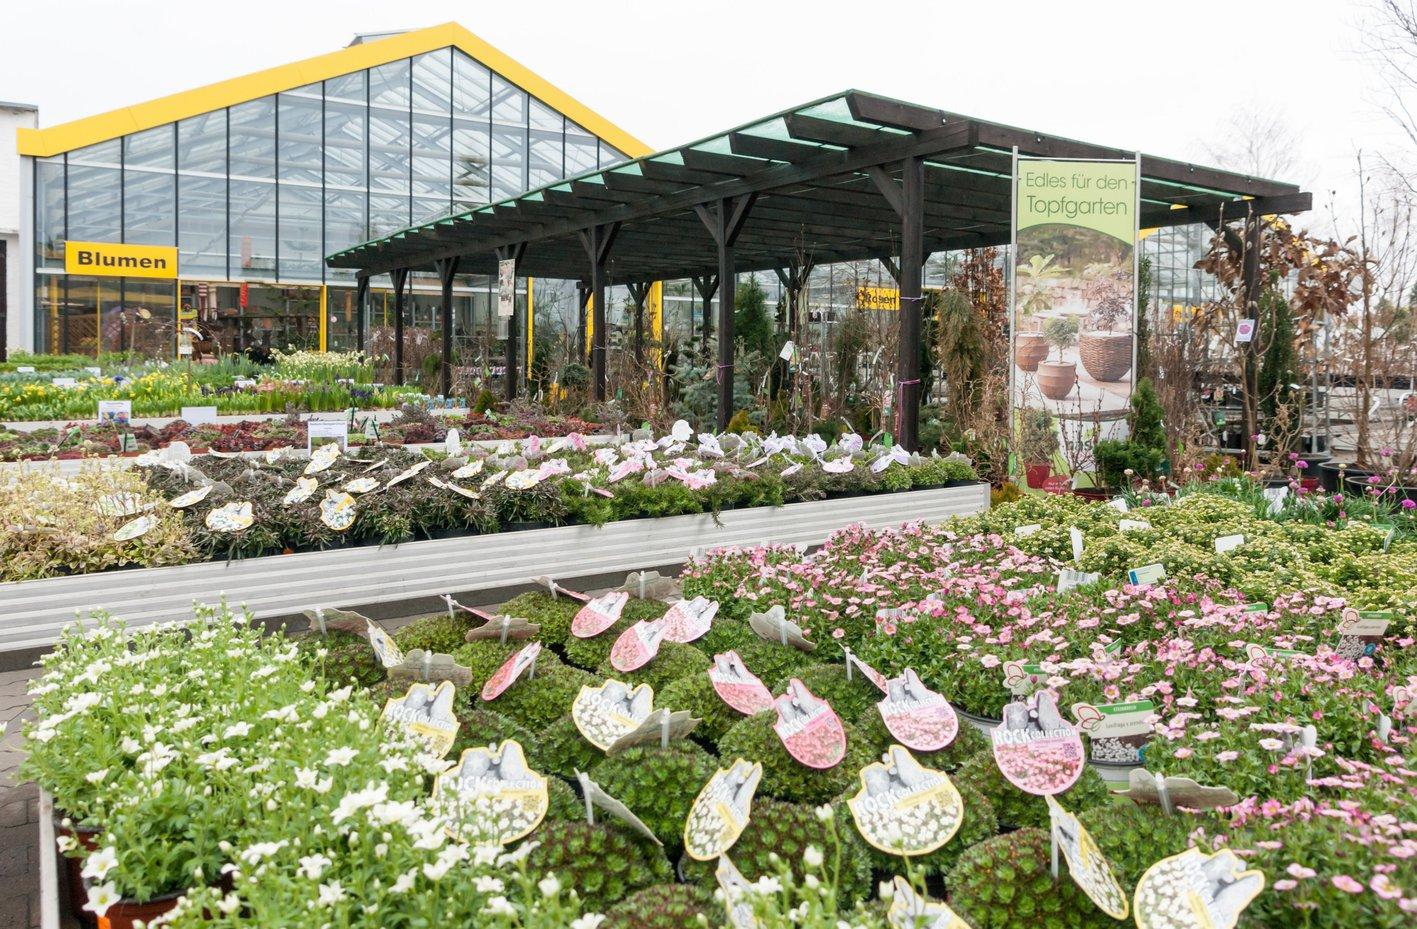 6 000 Quadratmeter umfasst das Verkaufsgebiet des Gartencenters.